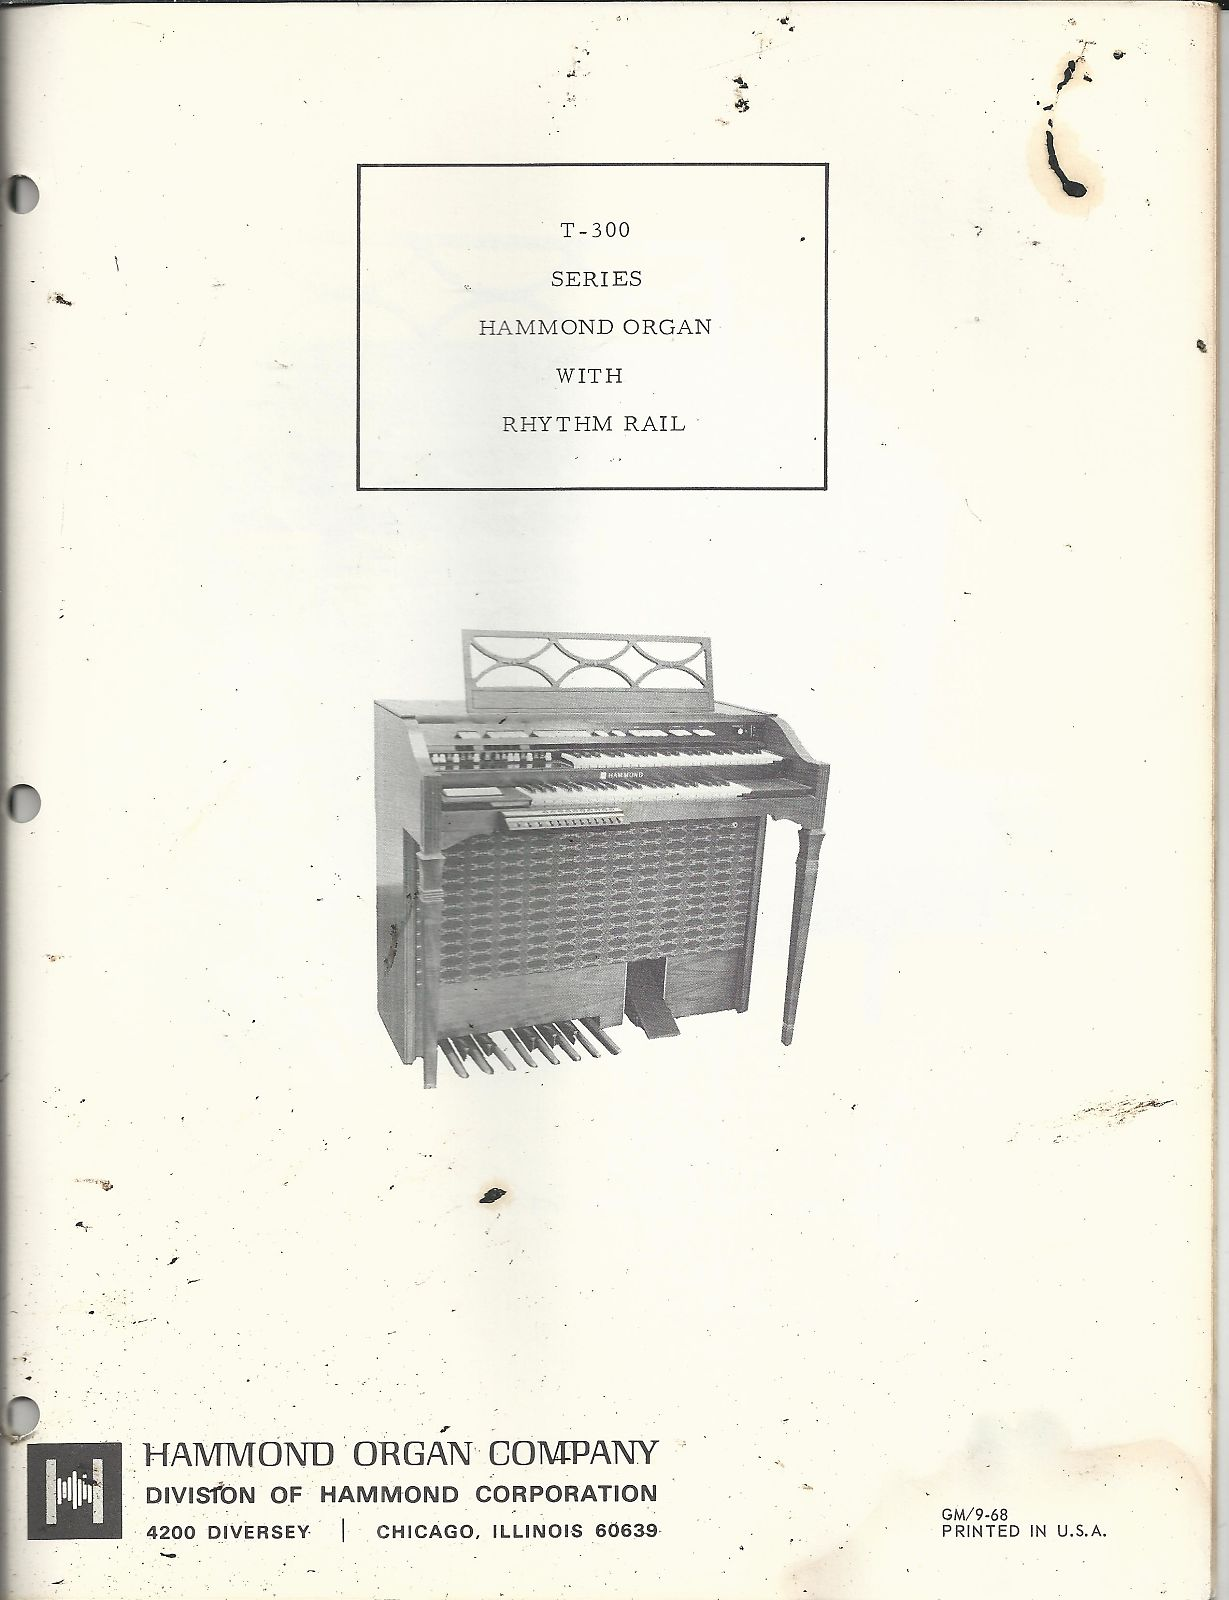 Hammond Series T-300 Service Manual 60's on